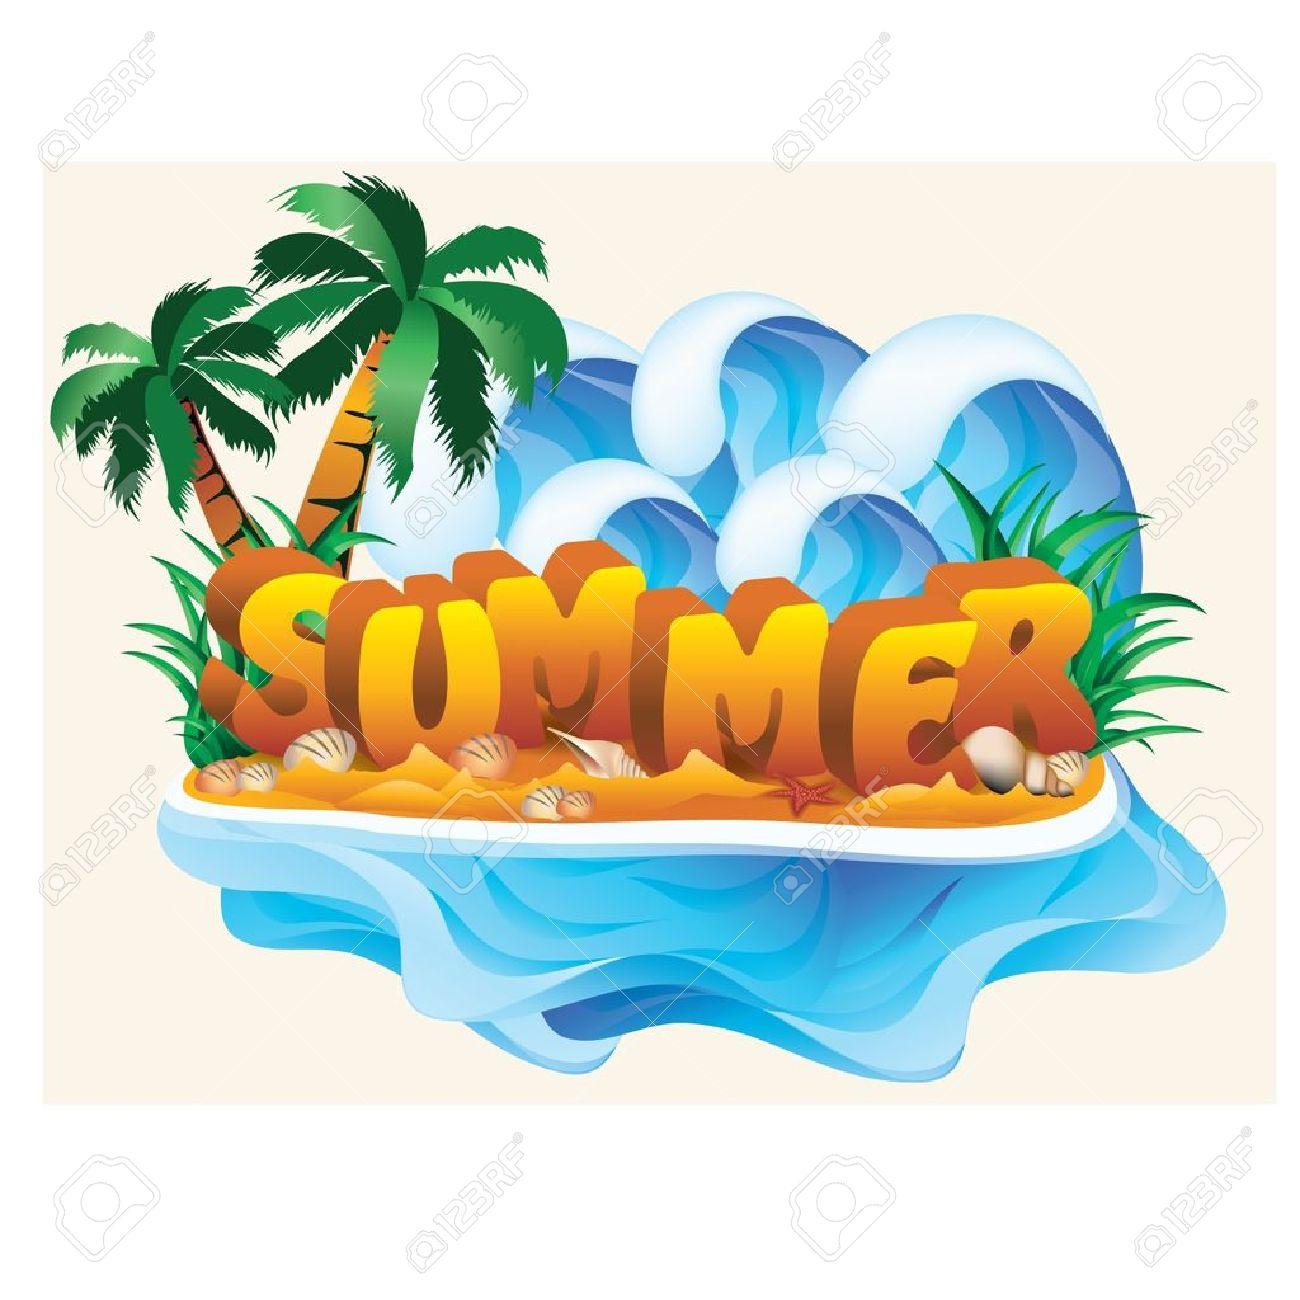 Best Summertime Clipart #7523.